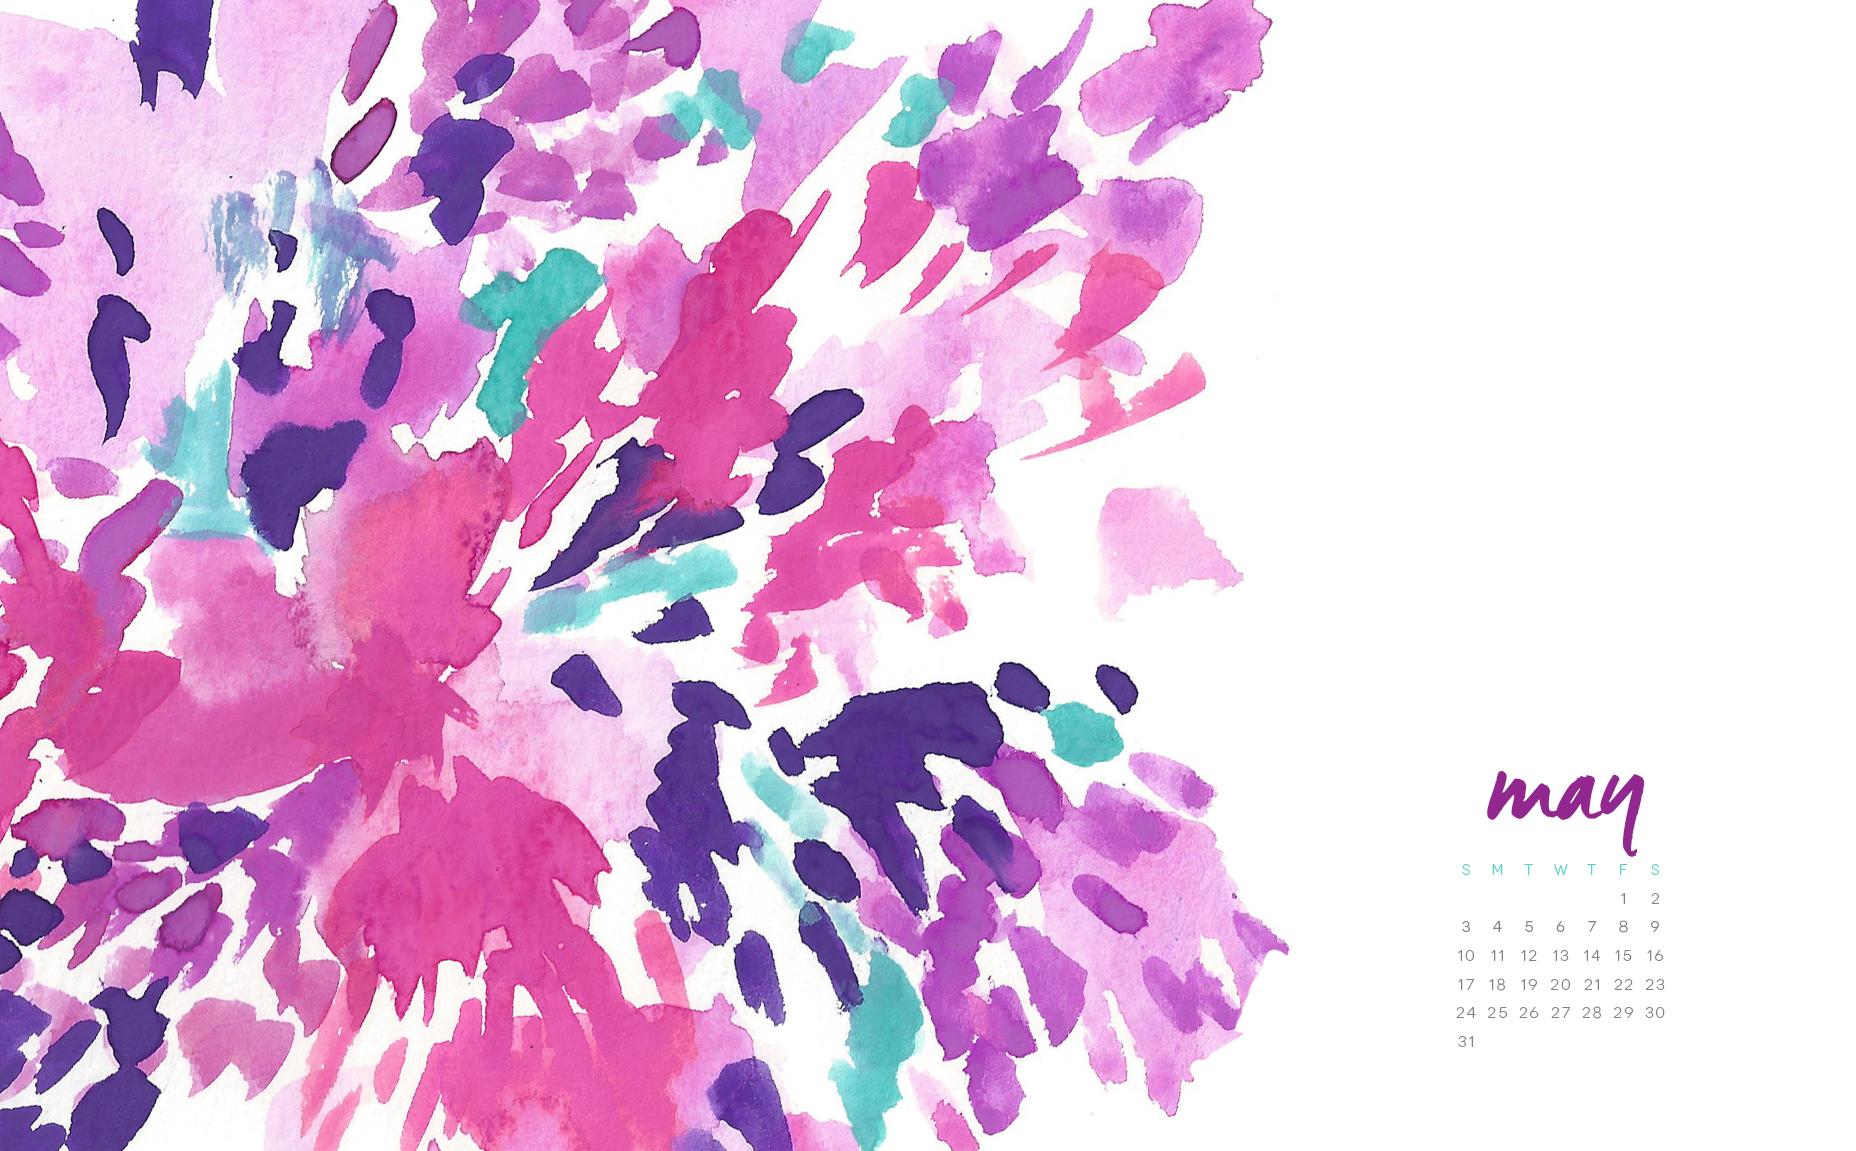 may floral splash desktop and phone wallpapers